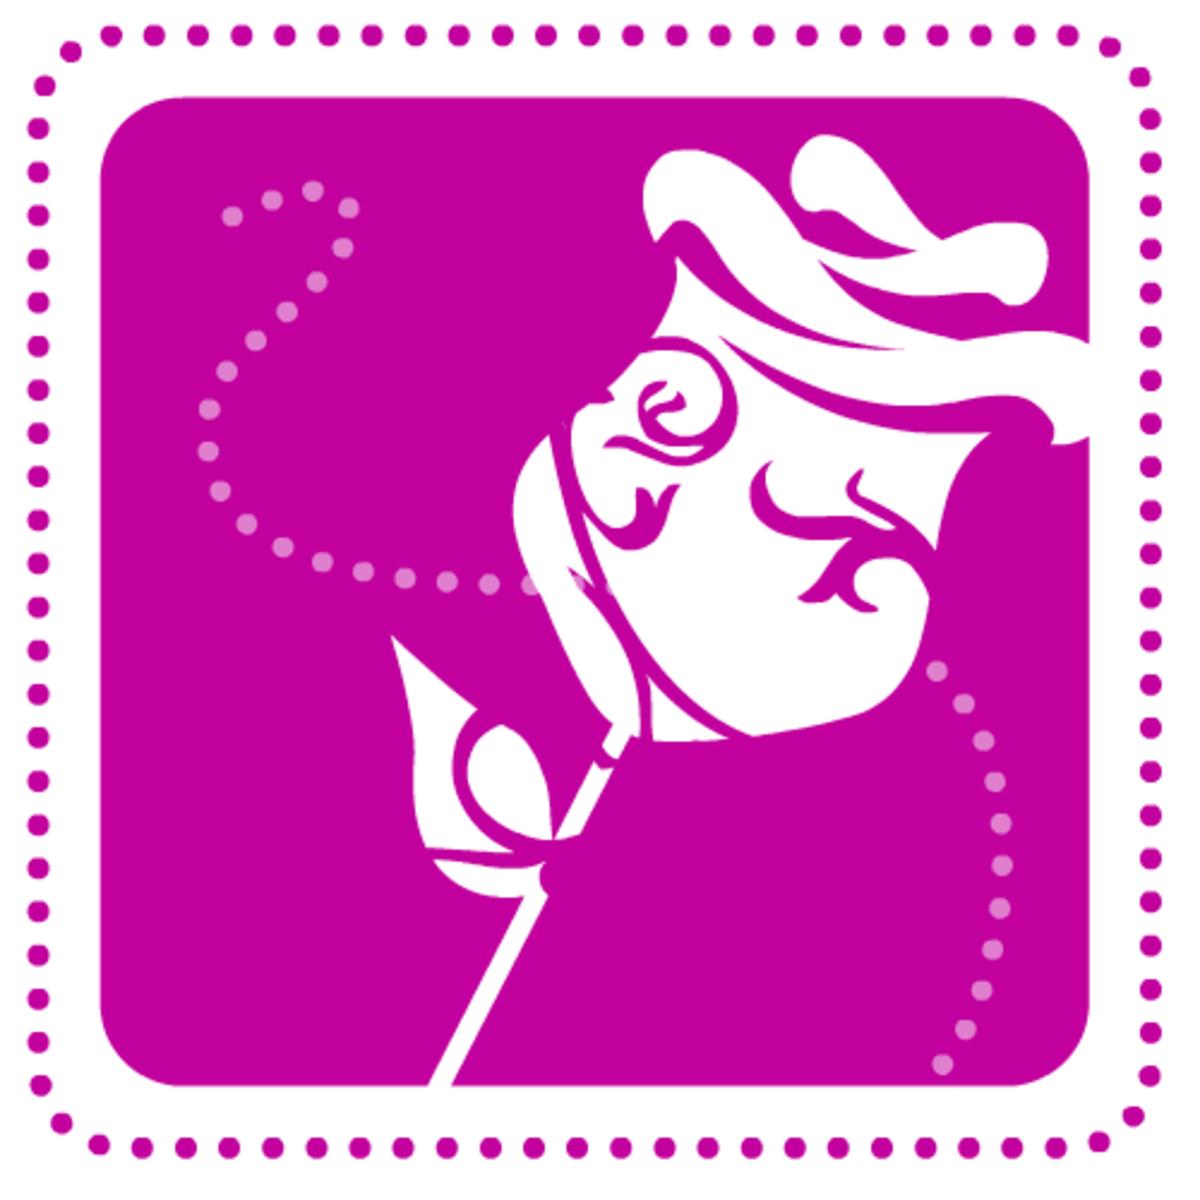 Free valentine clip art: purple rose